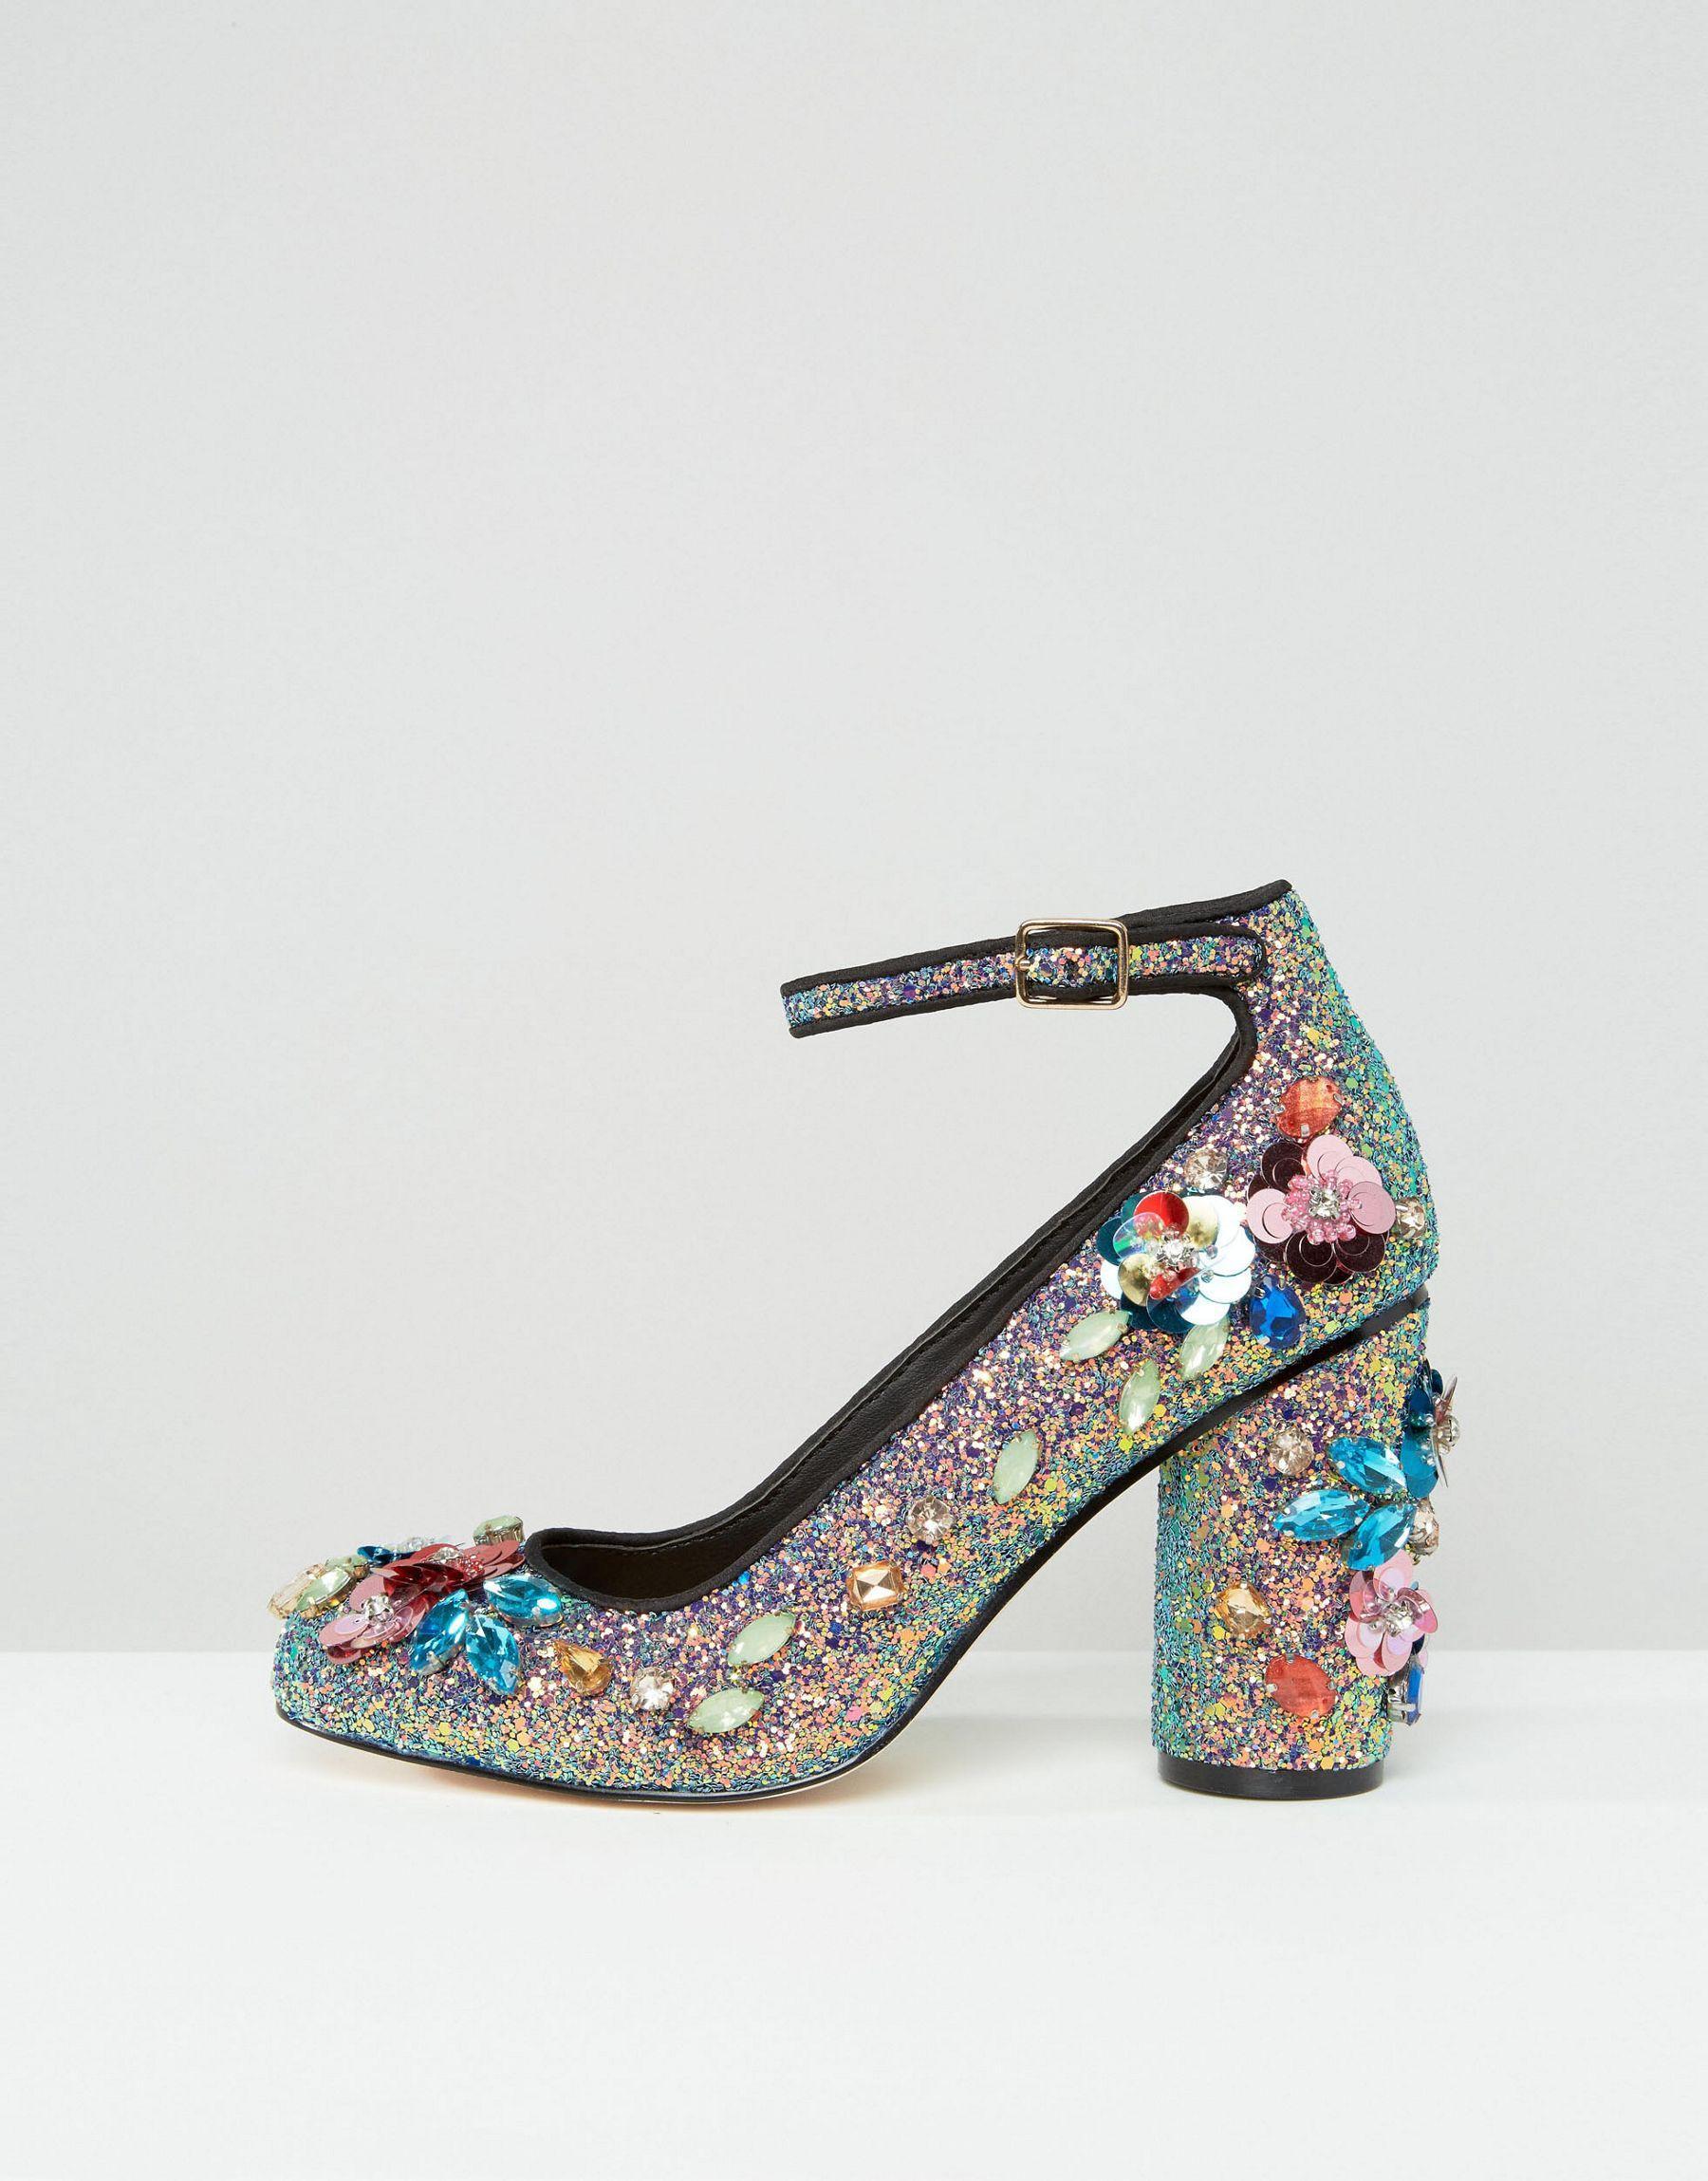 52b319d85ca1 ASOS Proven Embellished Heels in Blue - Lyst